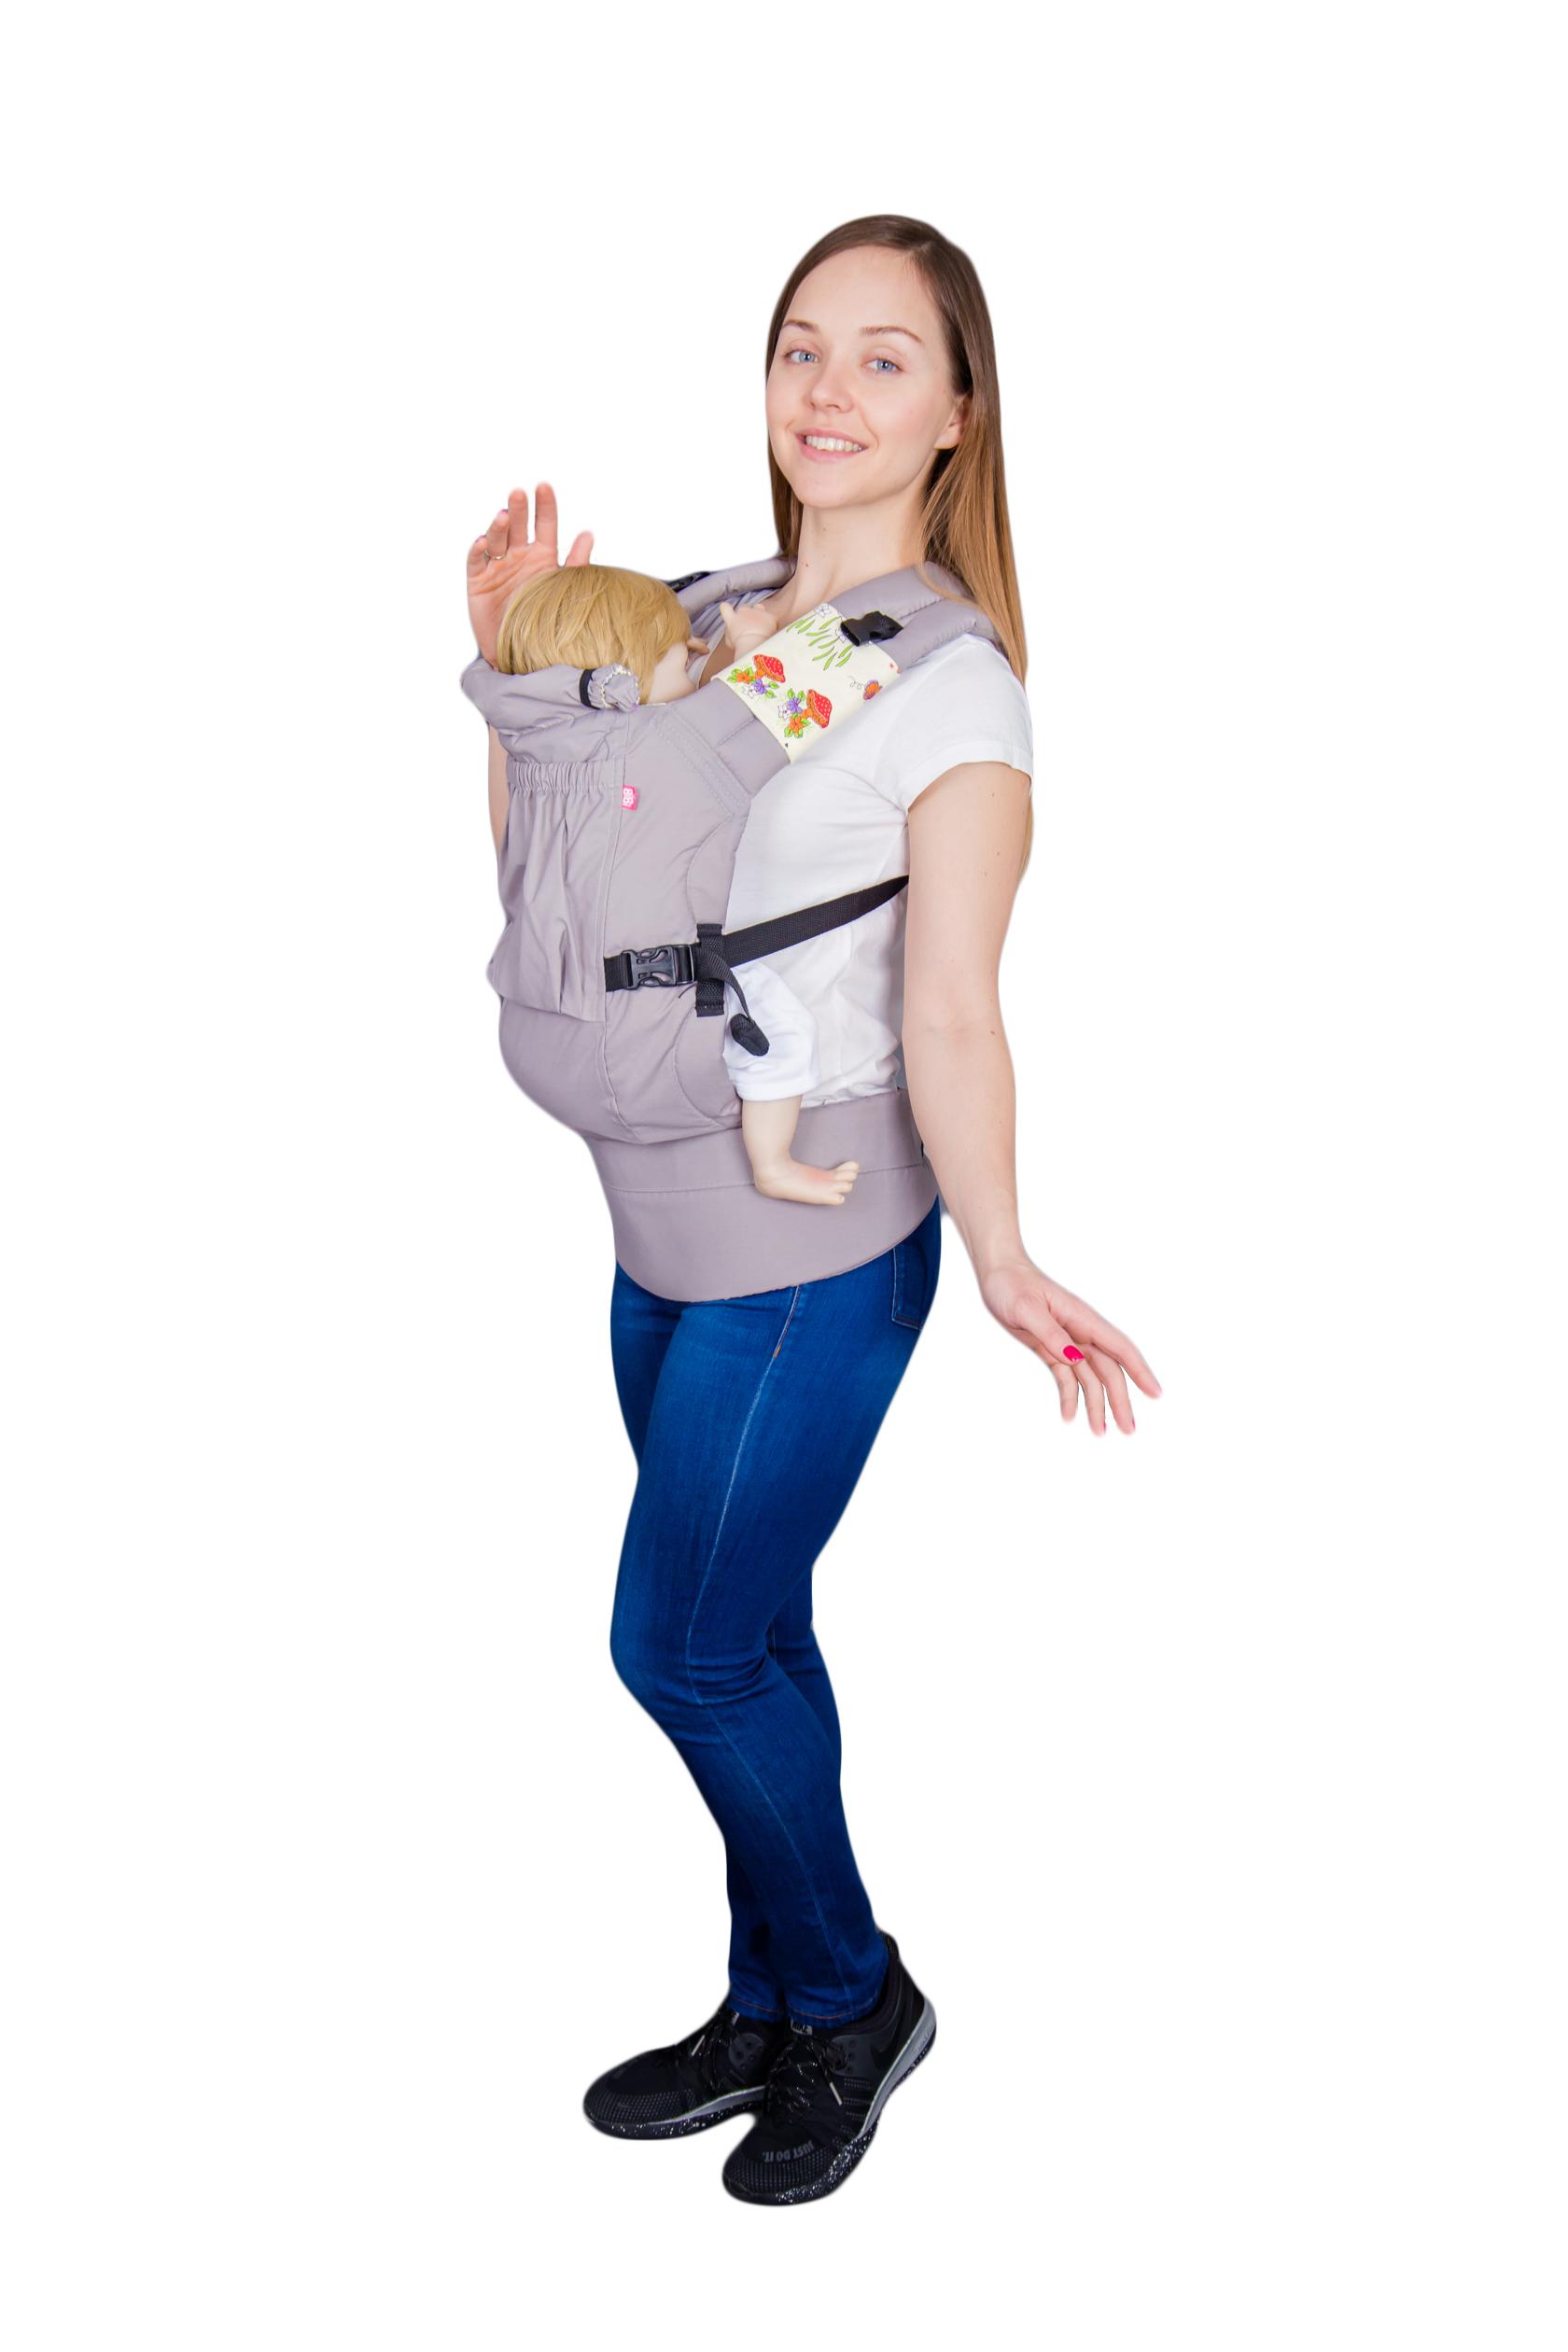 рюкзак переноска риббис bibi лён сиреневый Рюкзак-переноска Риббис Bibi Классик светло-серый